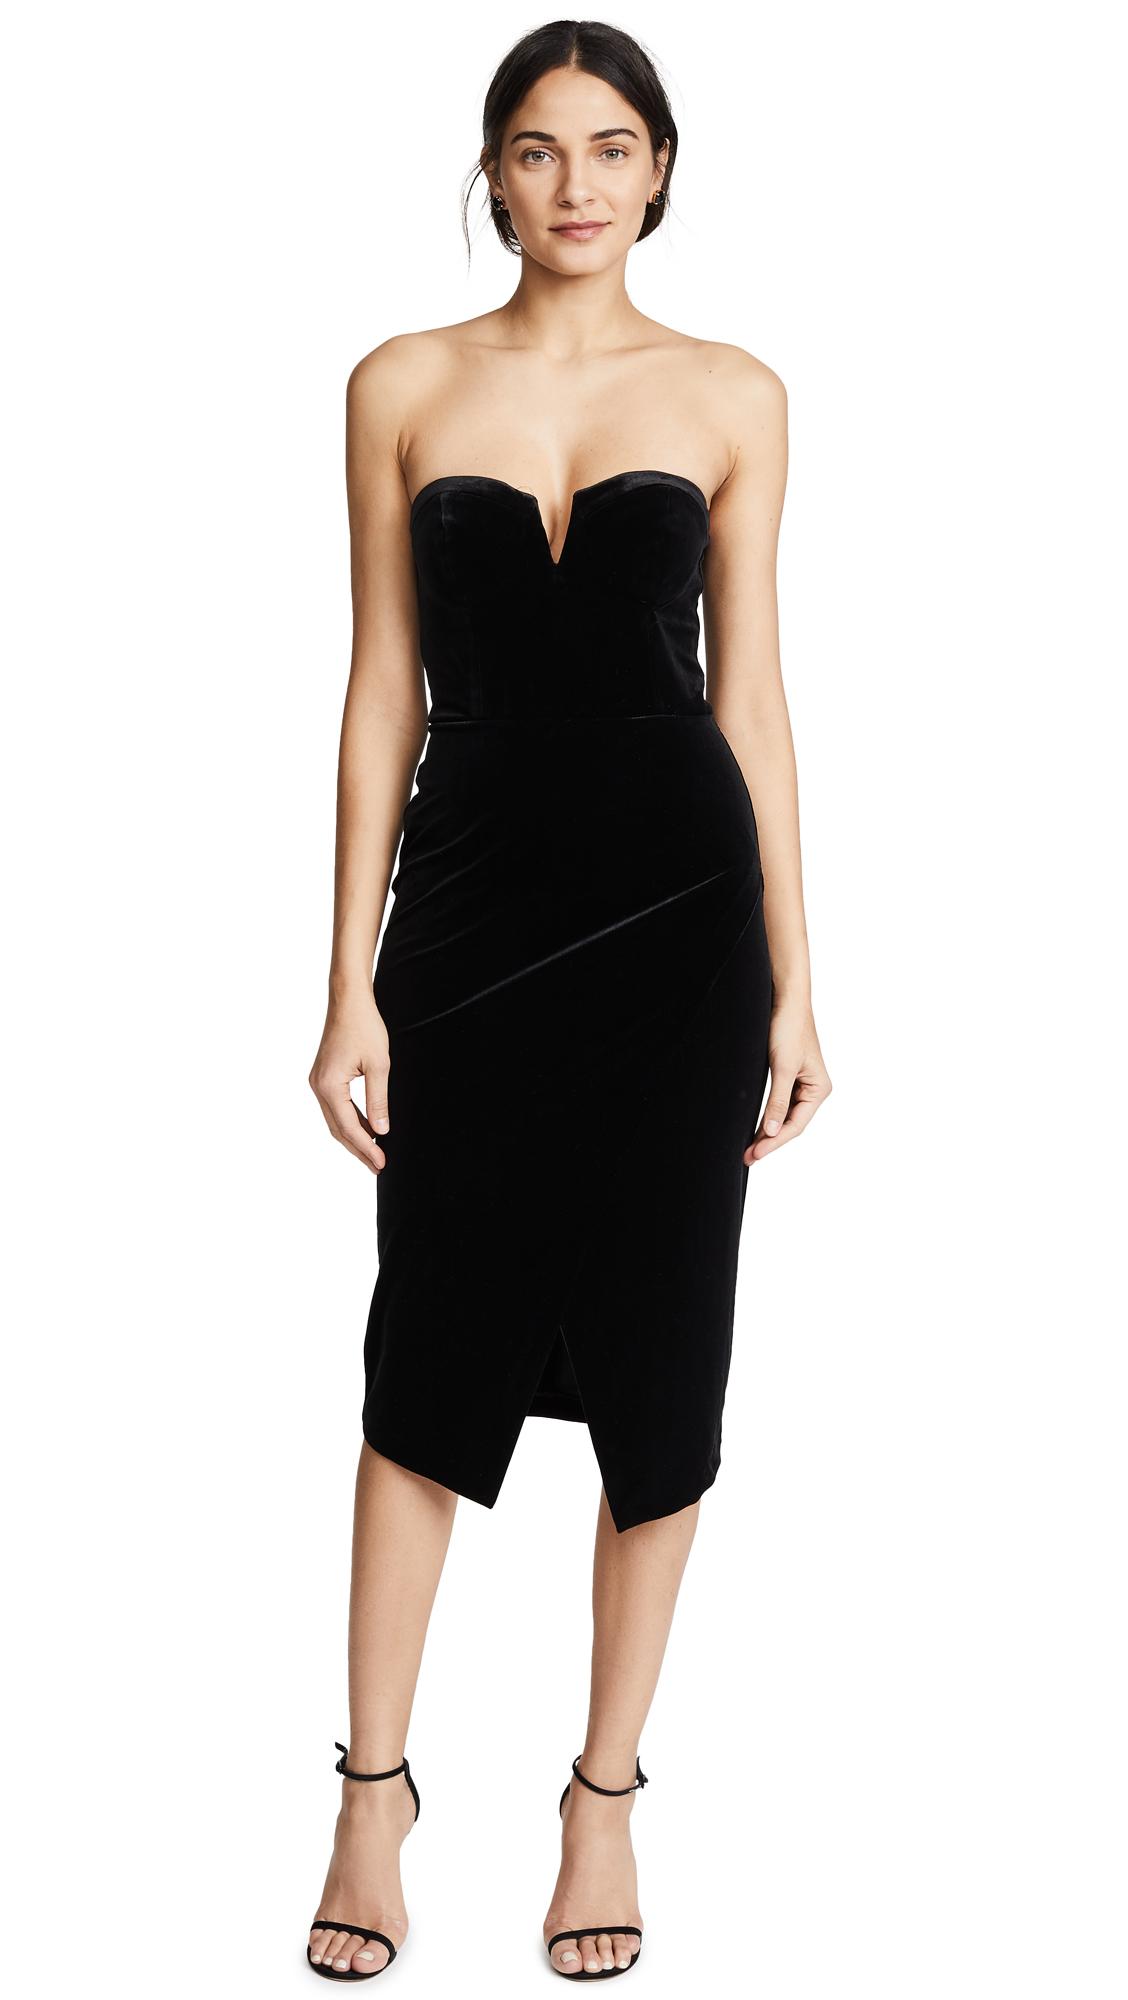 Yumi Kim Velour Allure Dress - Black